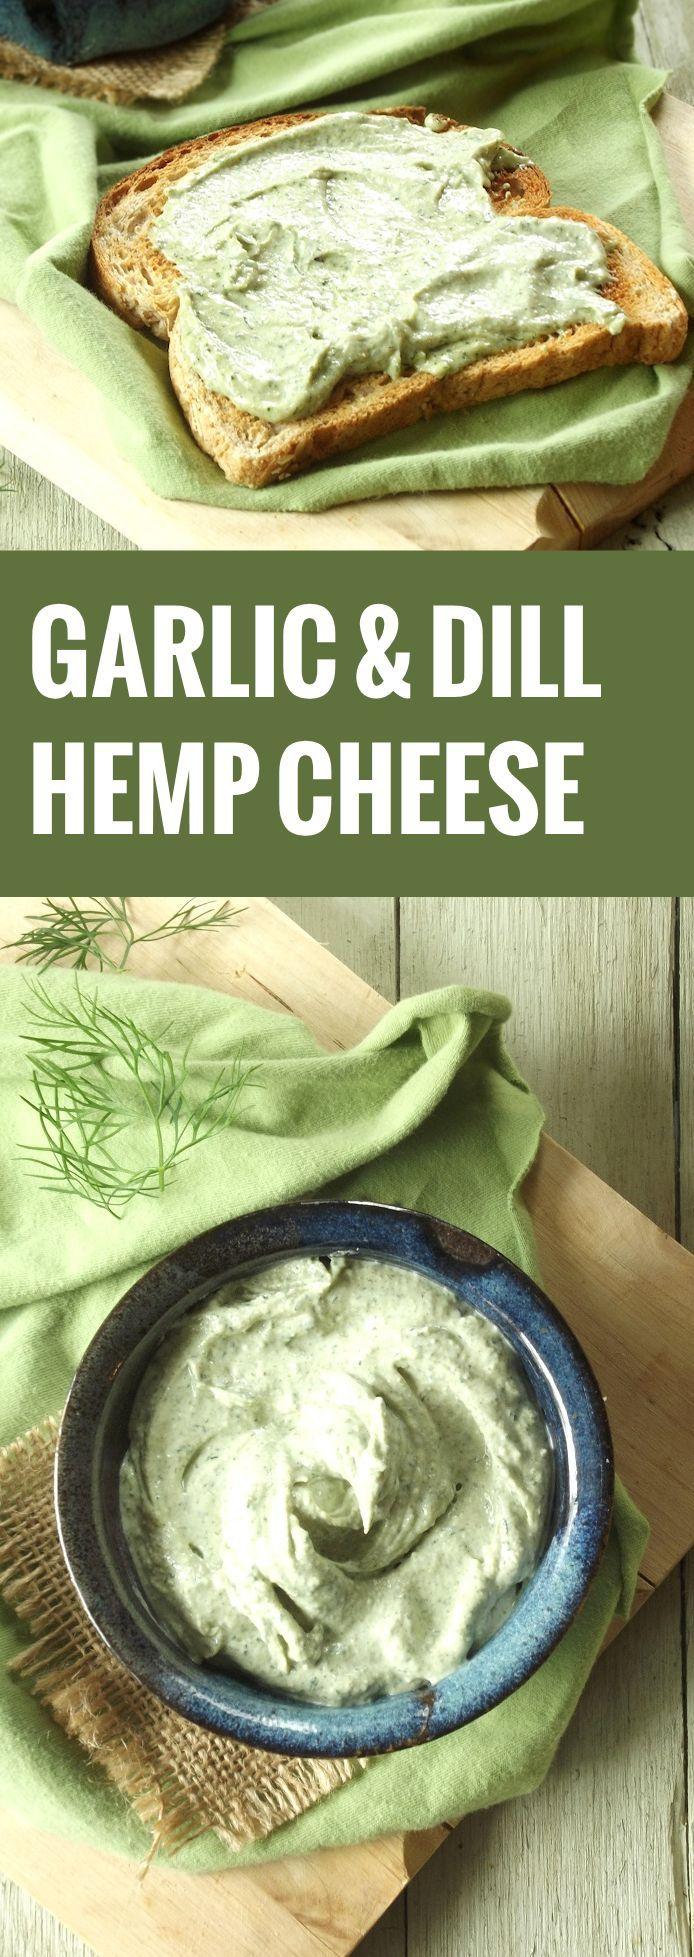 Garlic and Dill Hemp Cheese